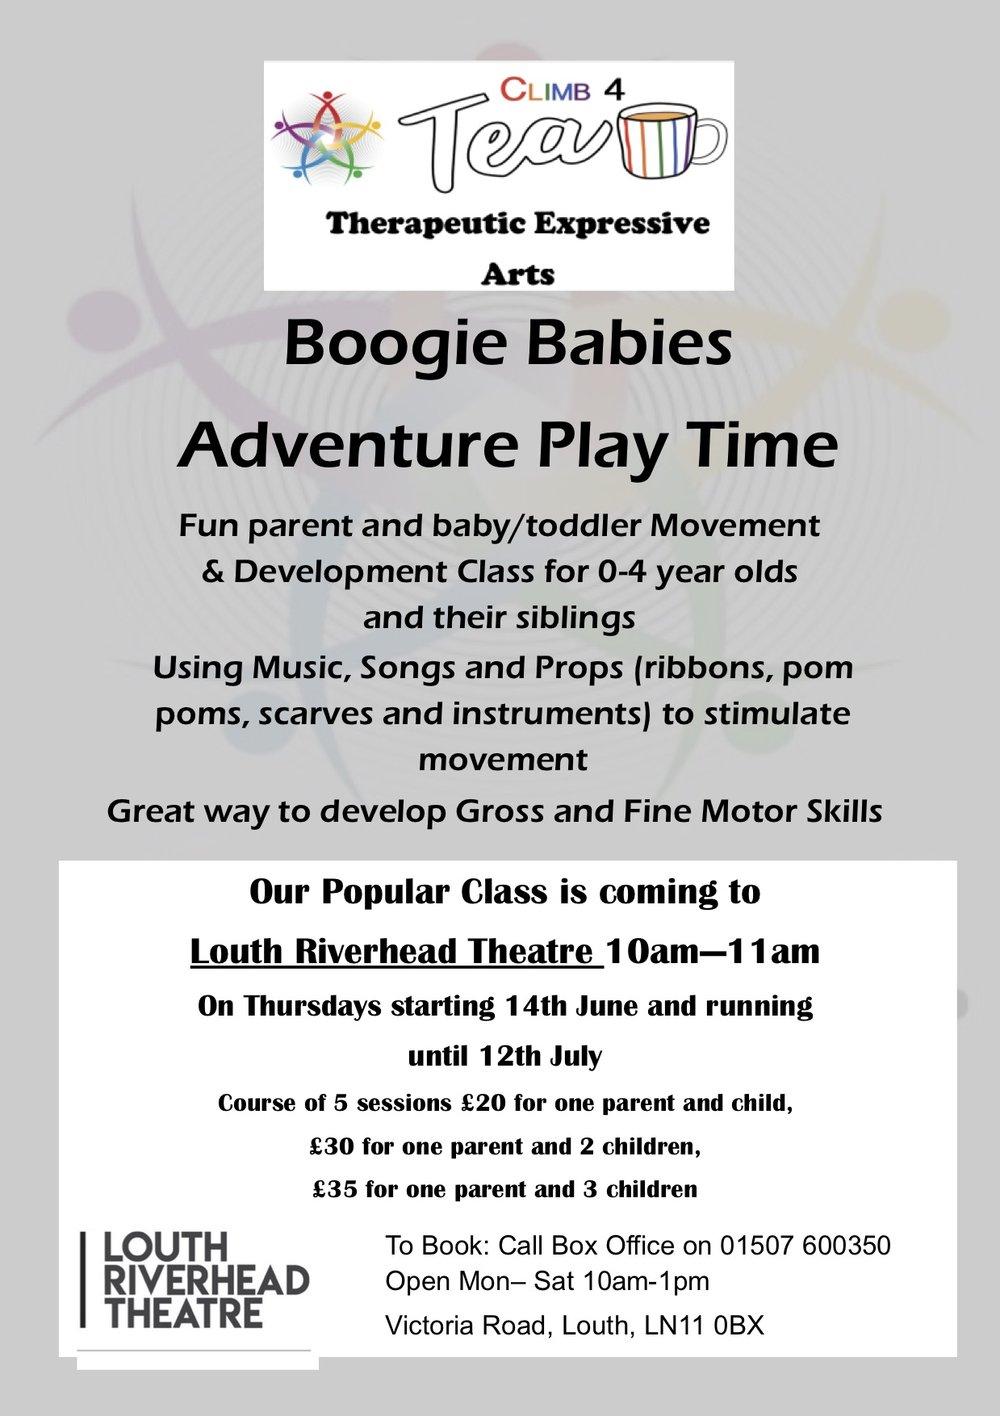 Boogie babies poster.jpg